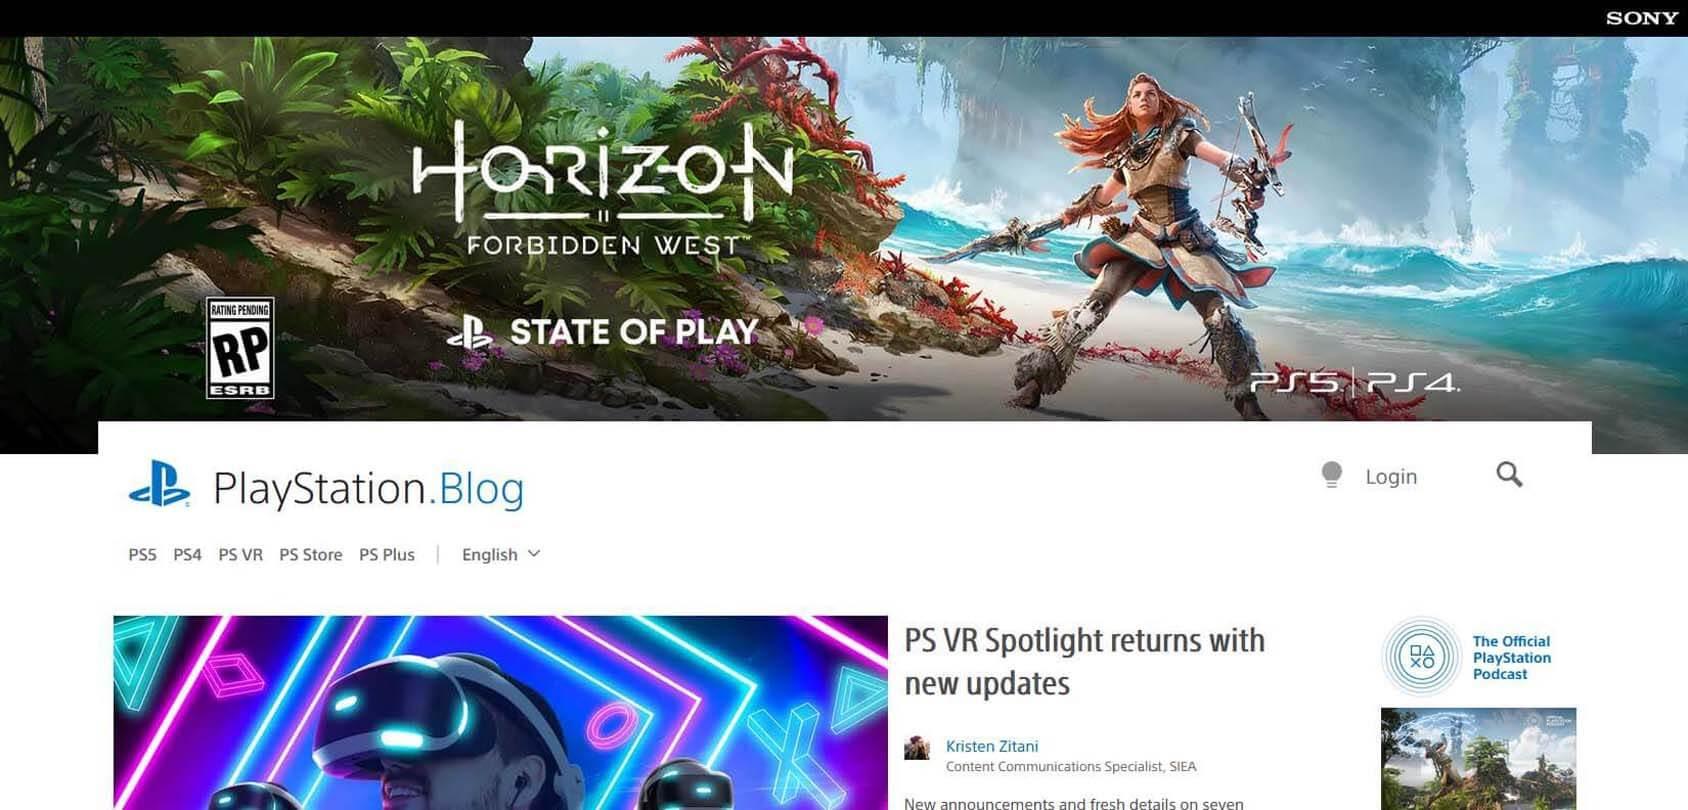 PlayStation.Blog Homepage